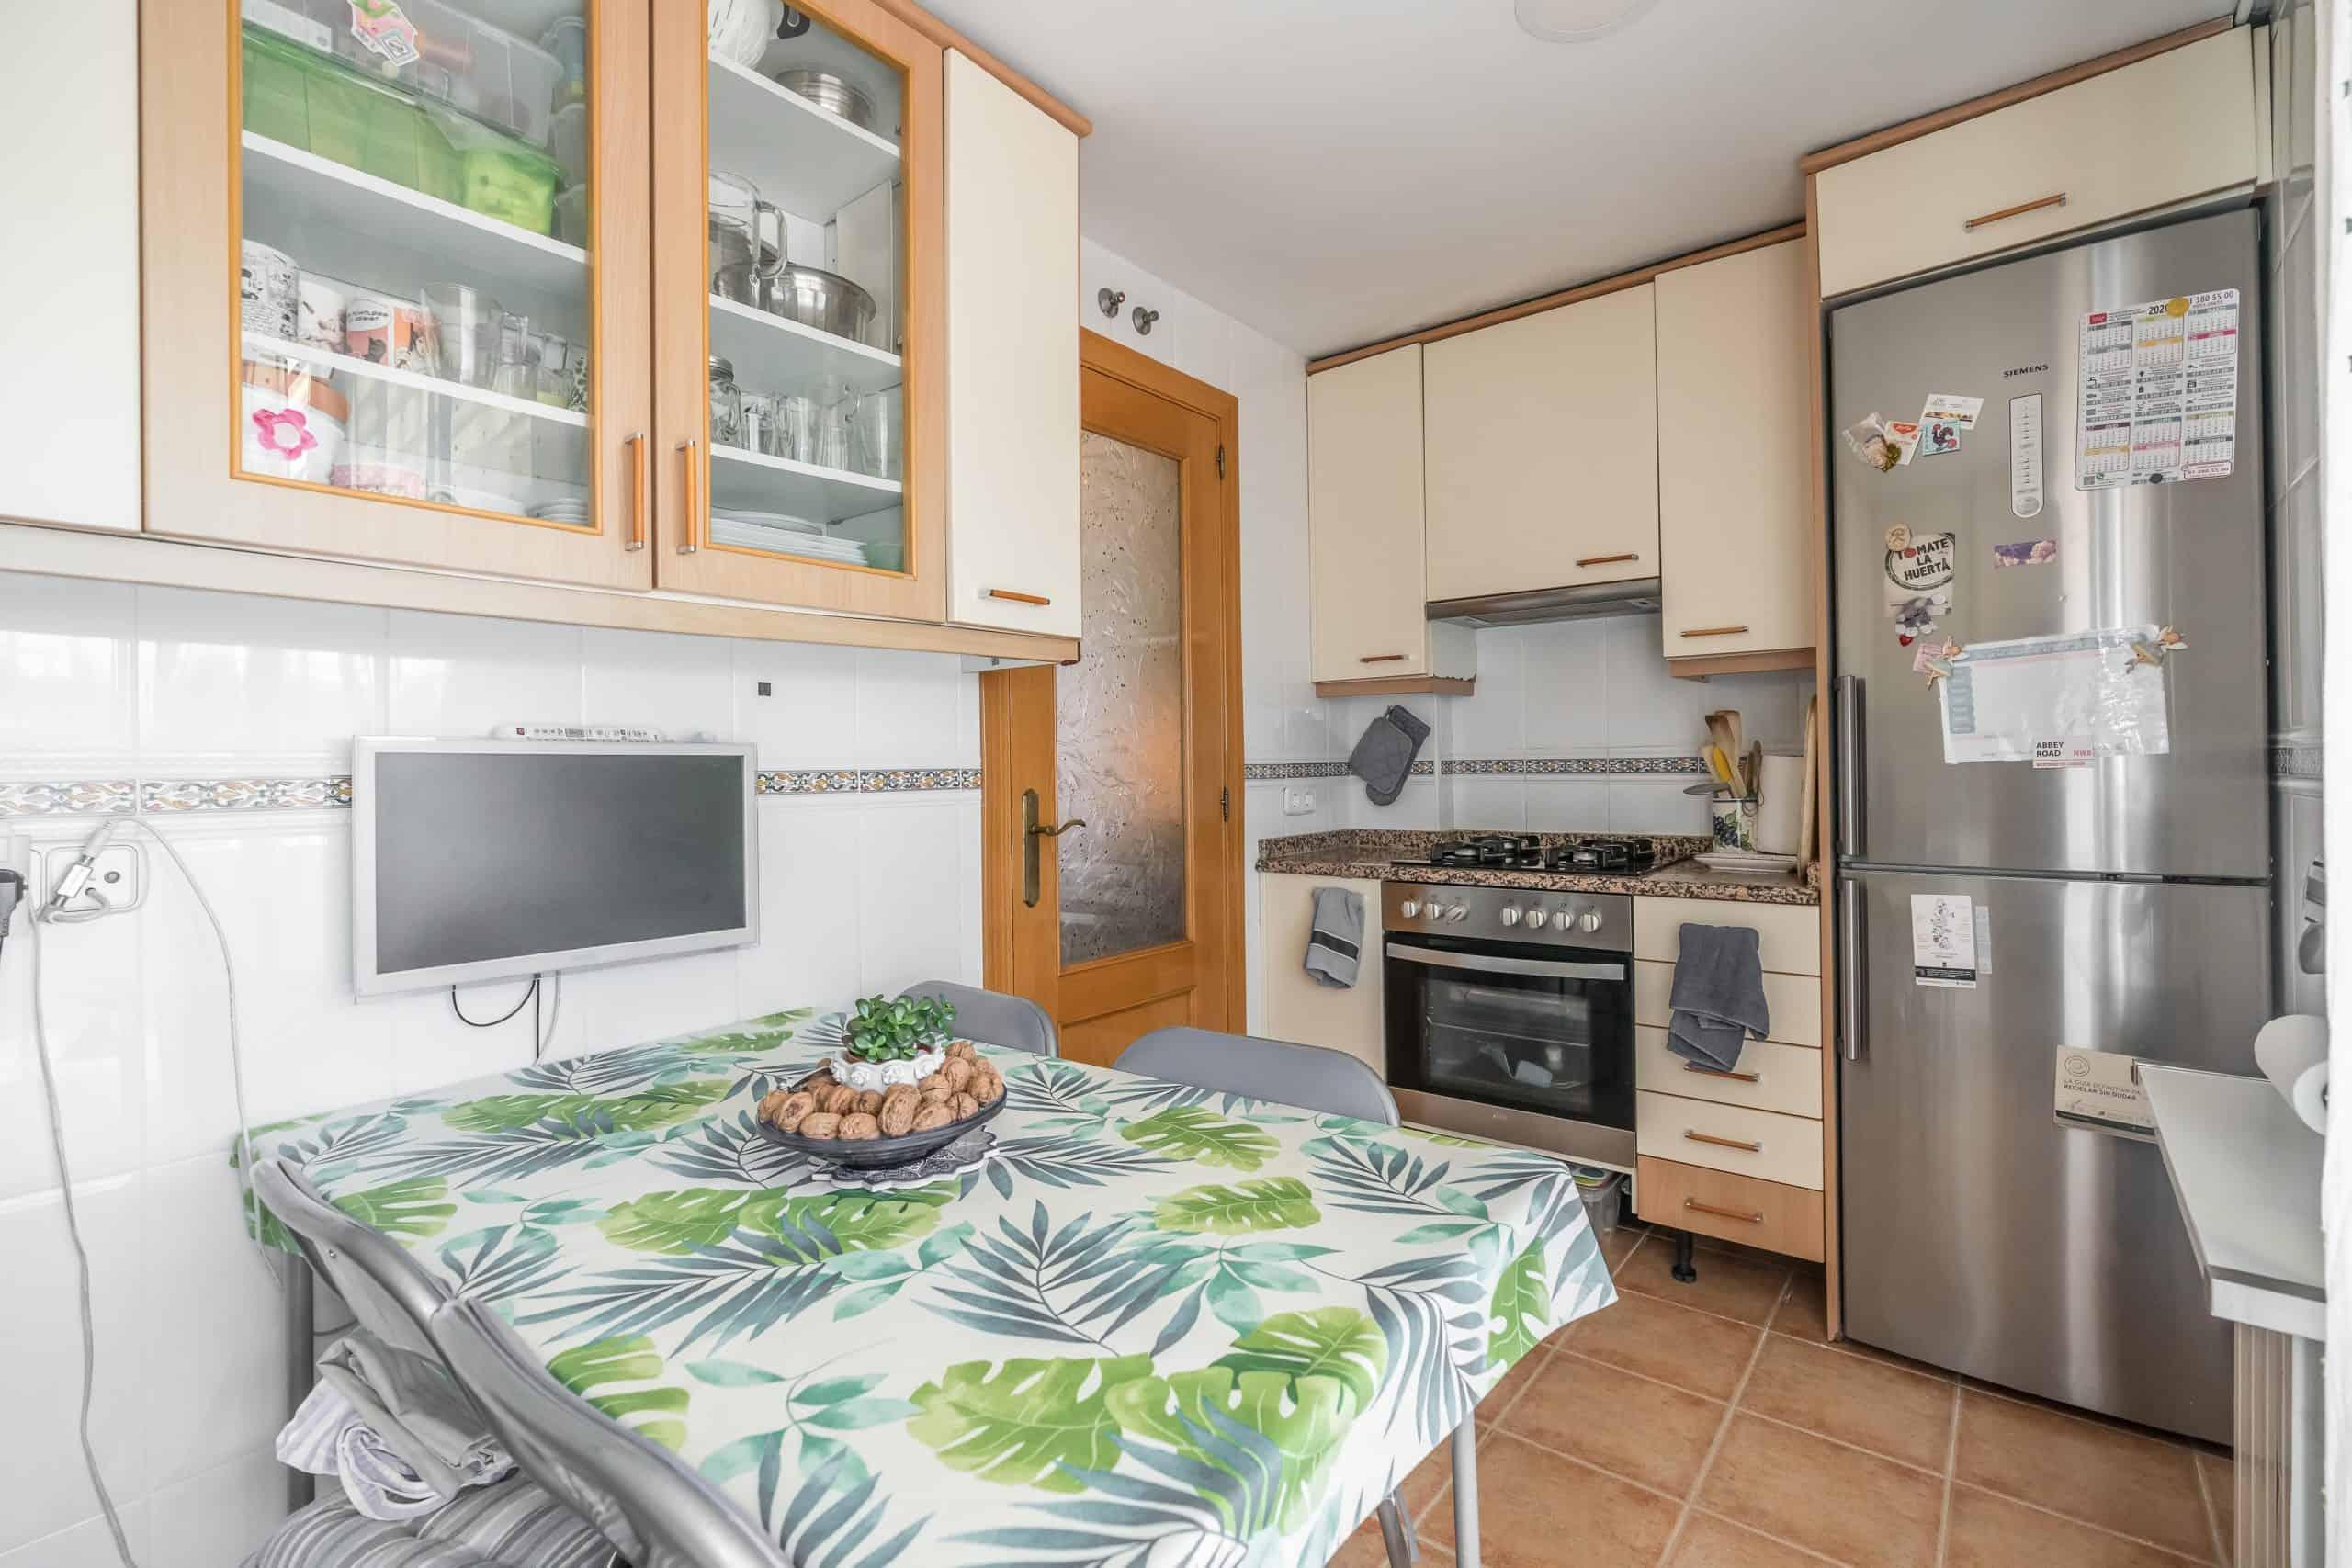 Agencia Inmobiliaria de Madrid-FUTUROCASA-Zona ARGANZUELA-EMBAJADORES-LEGAZPI7 COCINA (2)